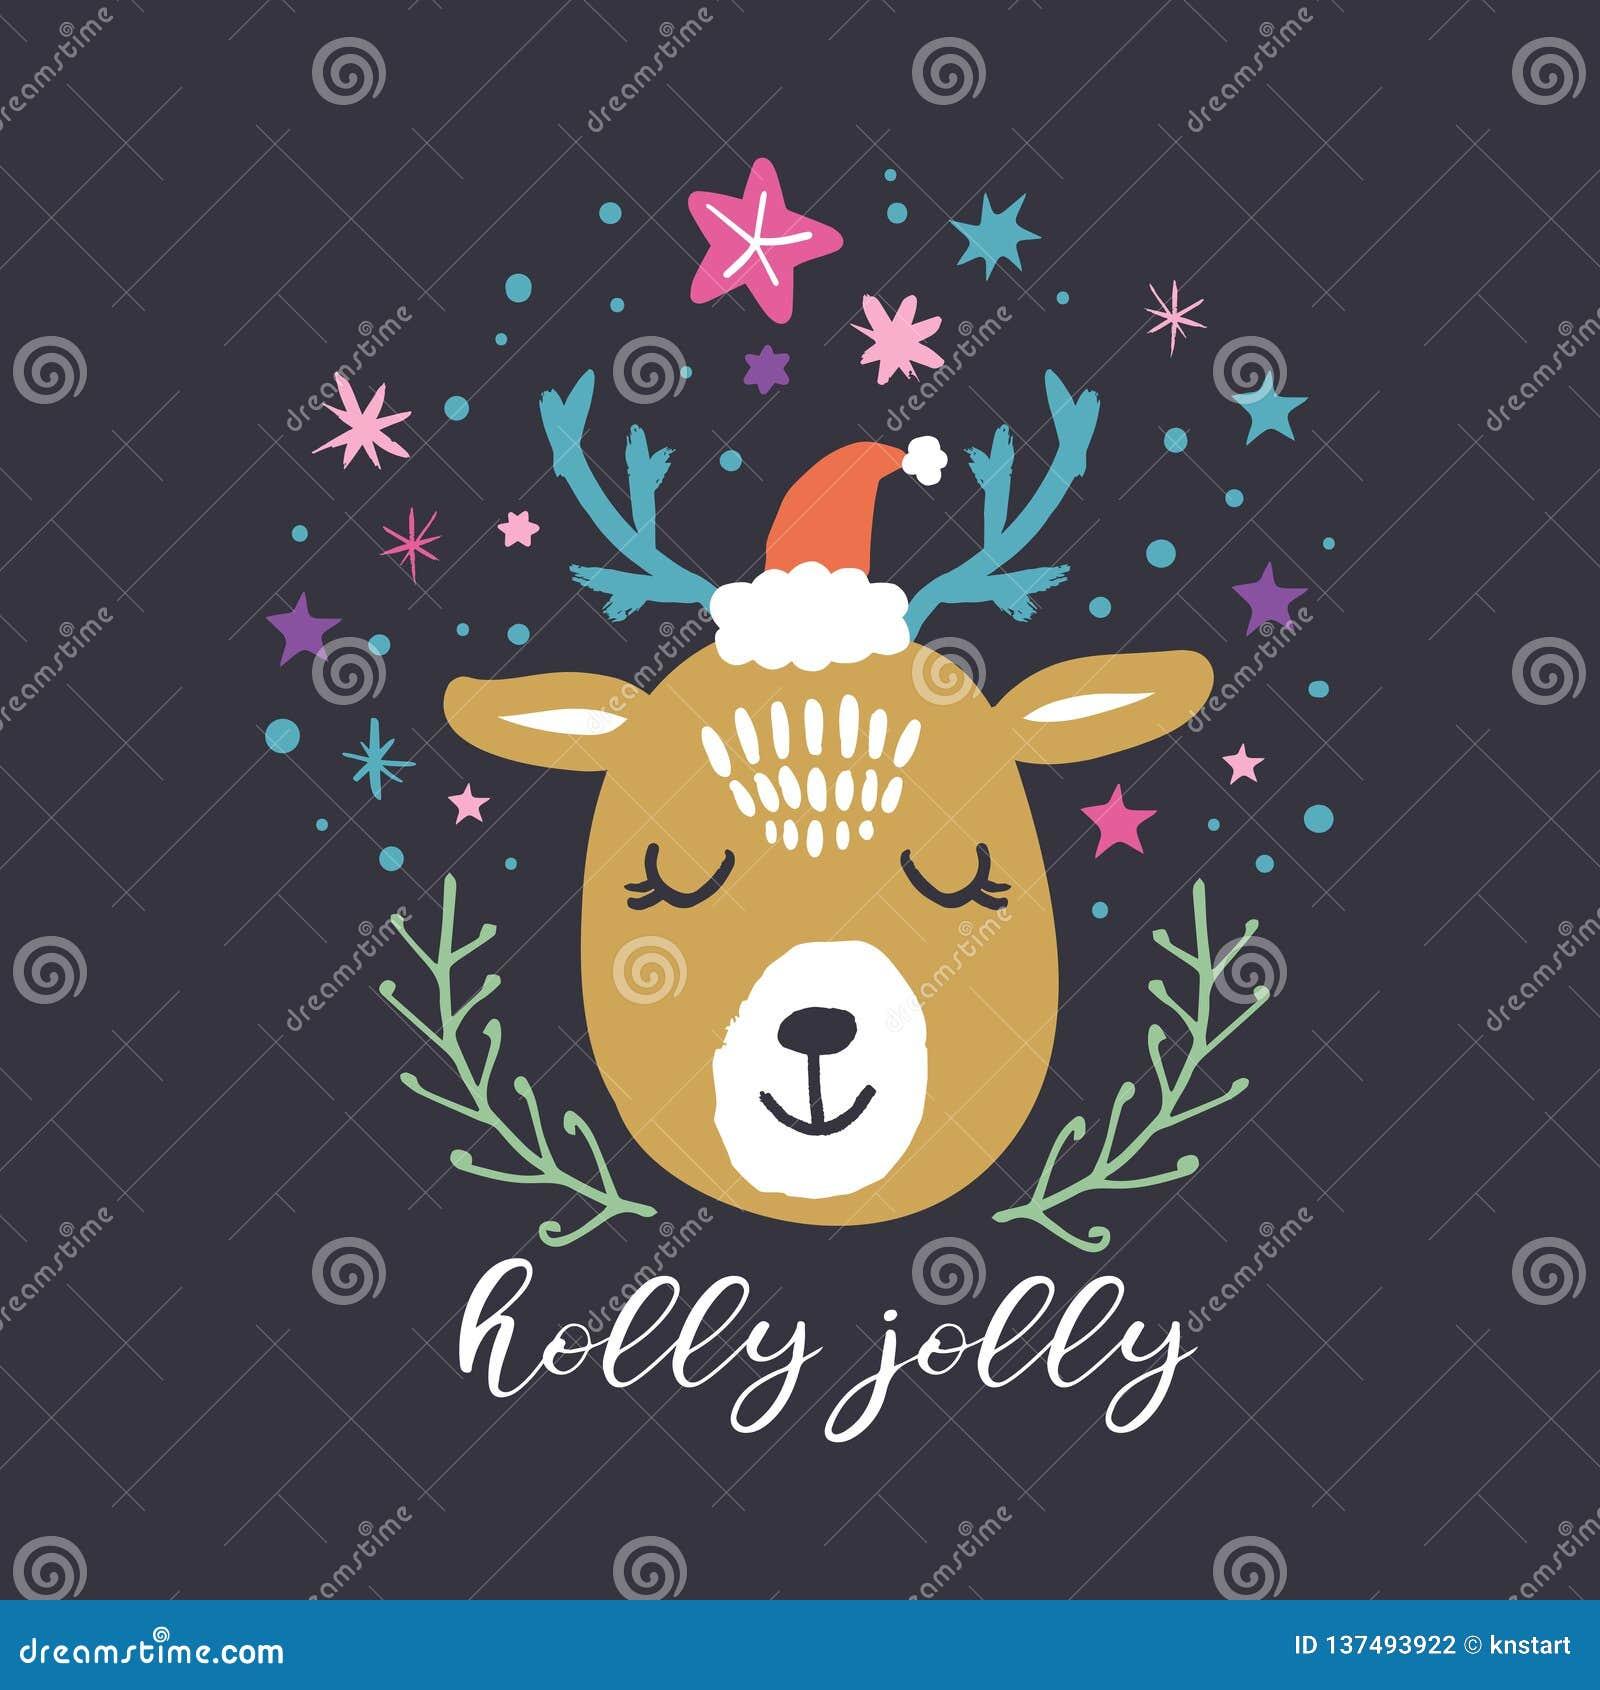 Polare Rotwild Sankt des netten Winters des Vektors Frohe Weihnachten, Holly Jolly Kindertagesstättenfeiertagsillustration